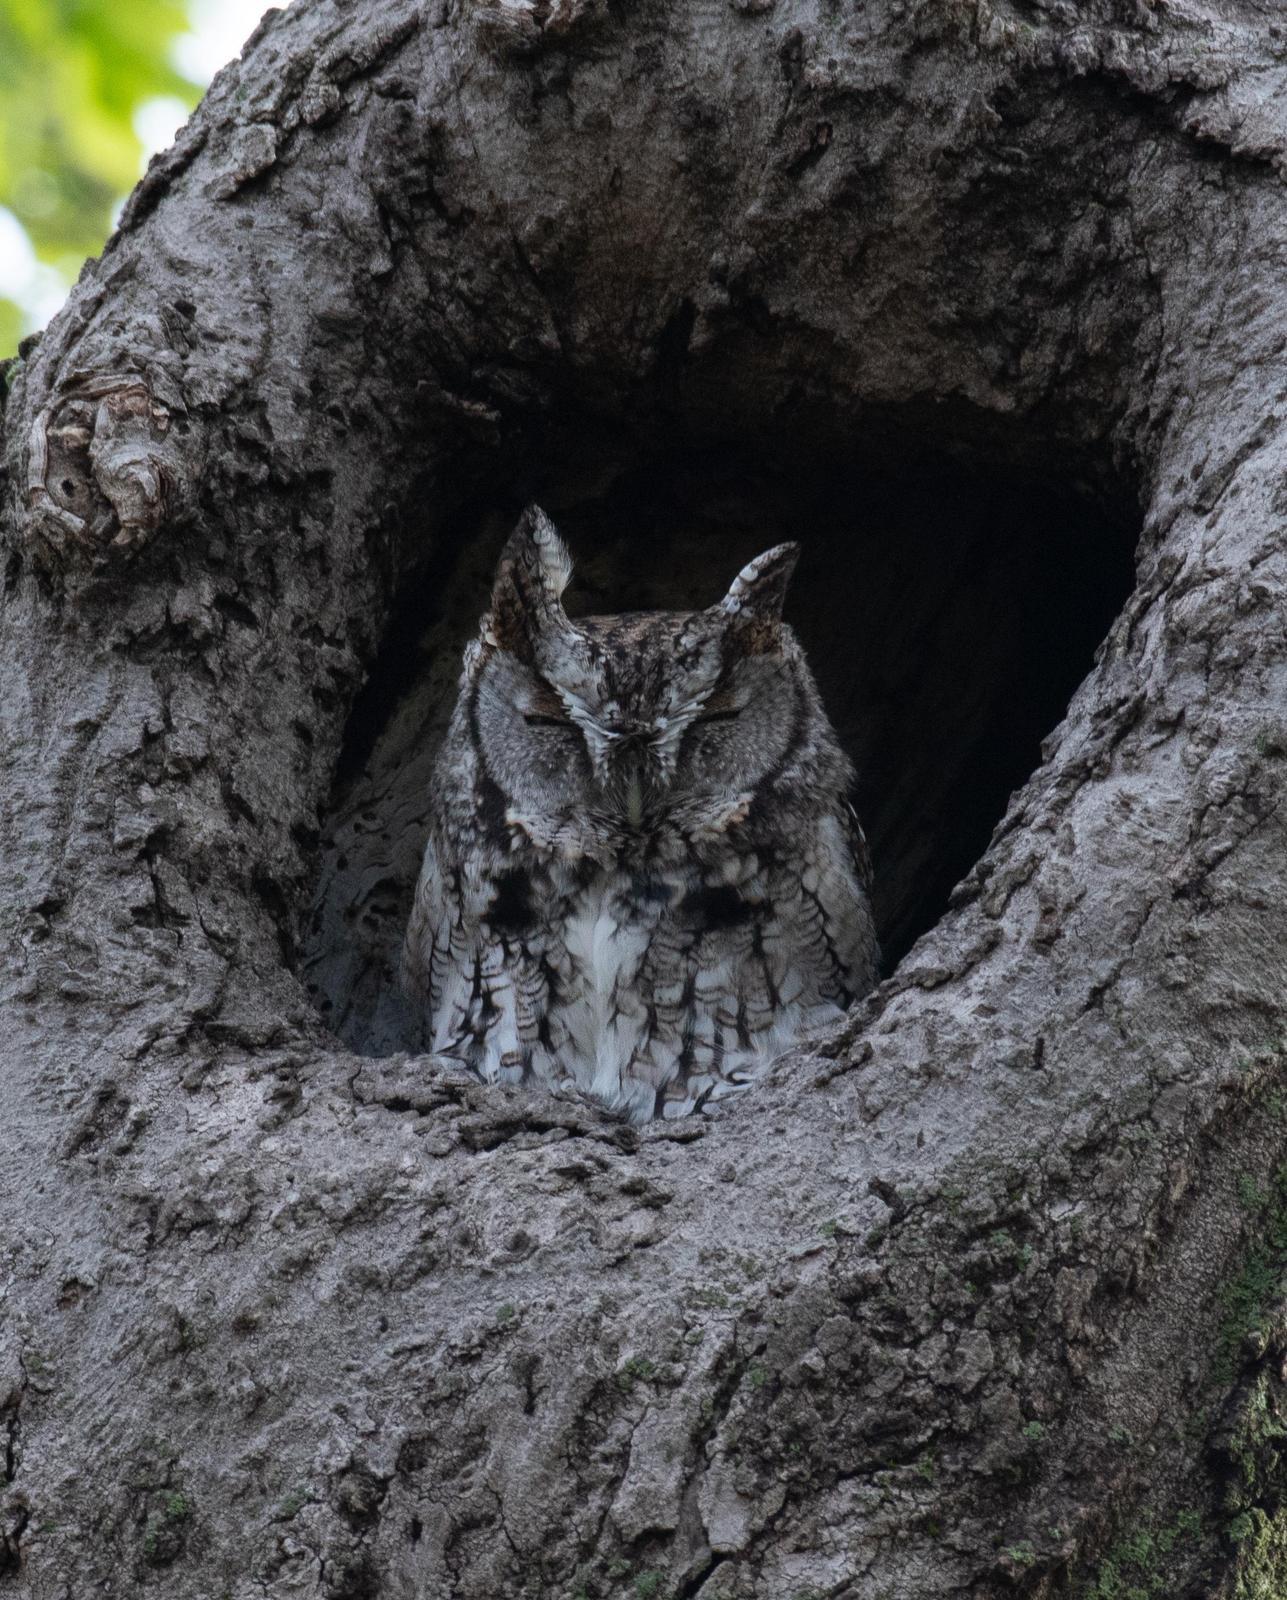 Eastern Screech-Owl Photo by Hume Vance